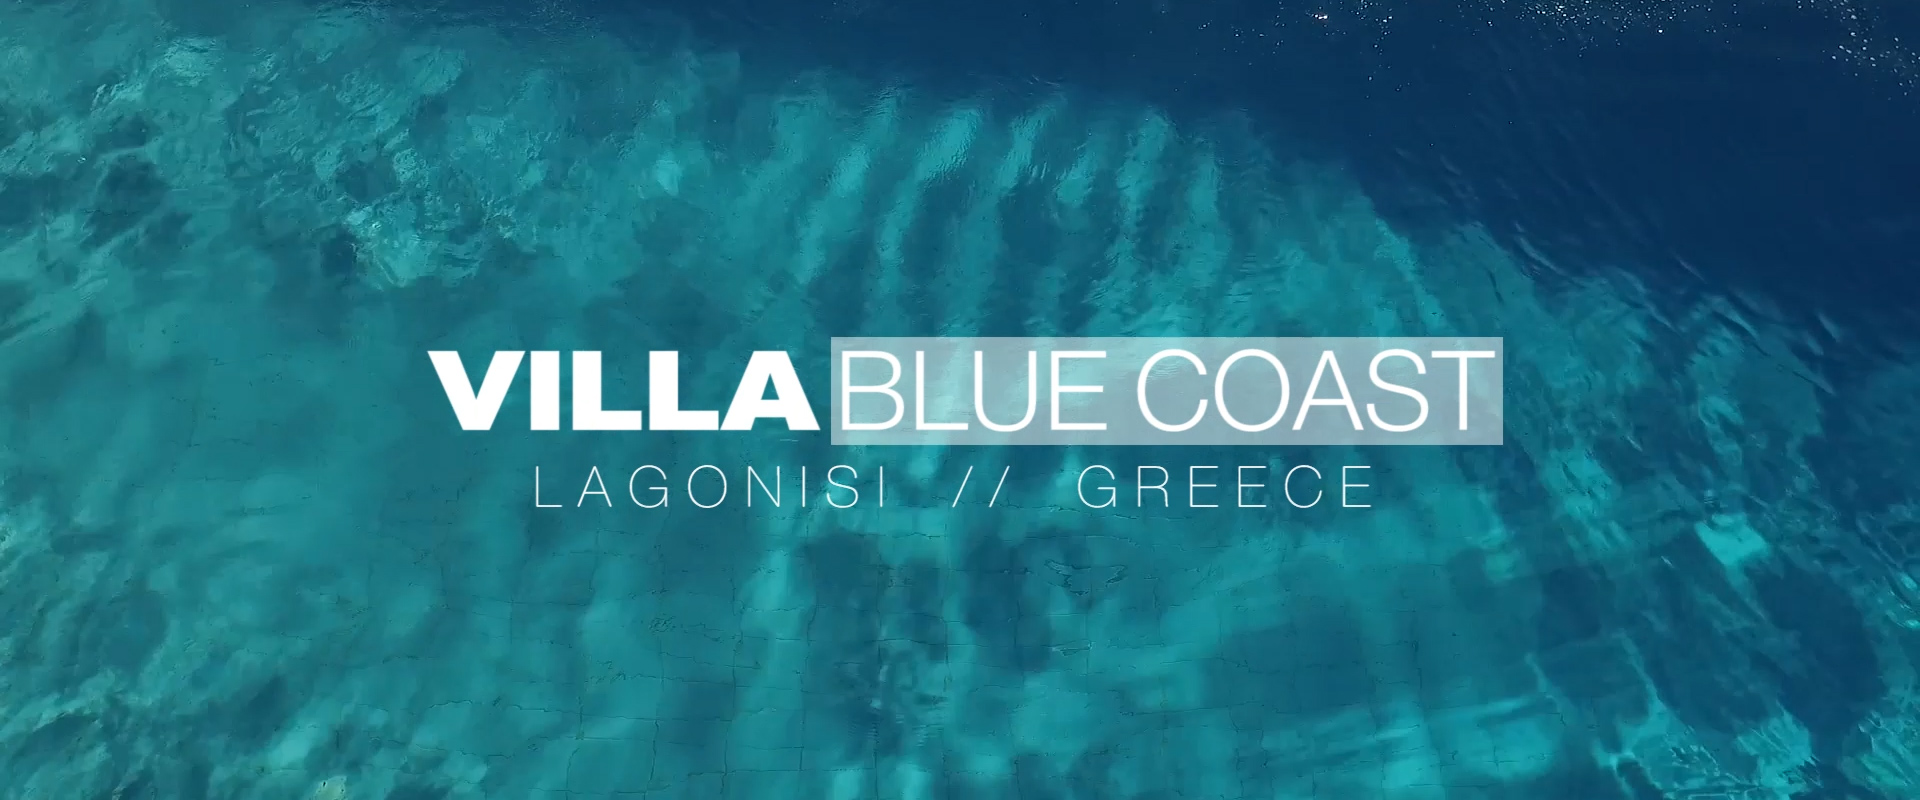 Villa bleu coast promo corporate video lifestyle resort